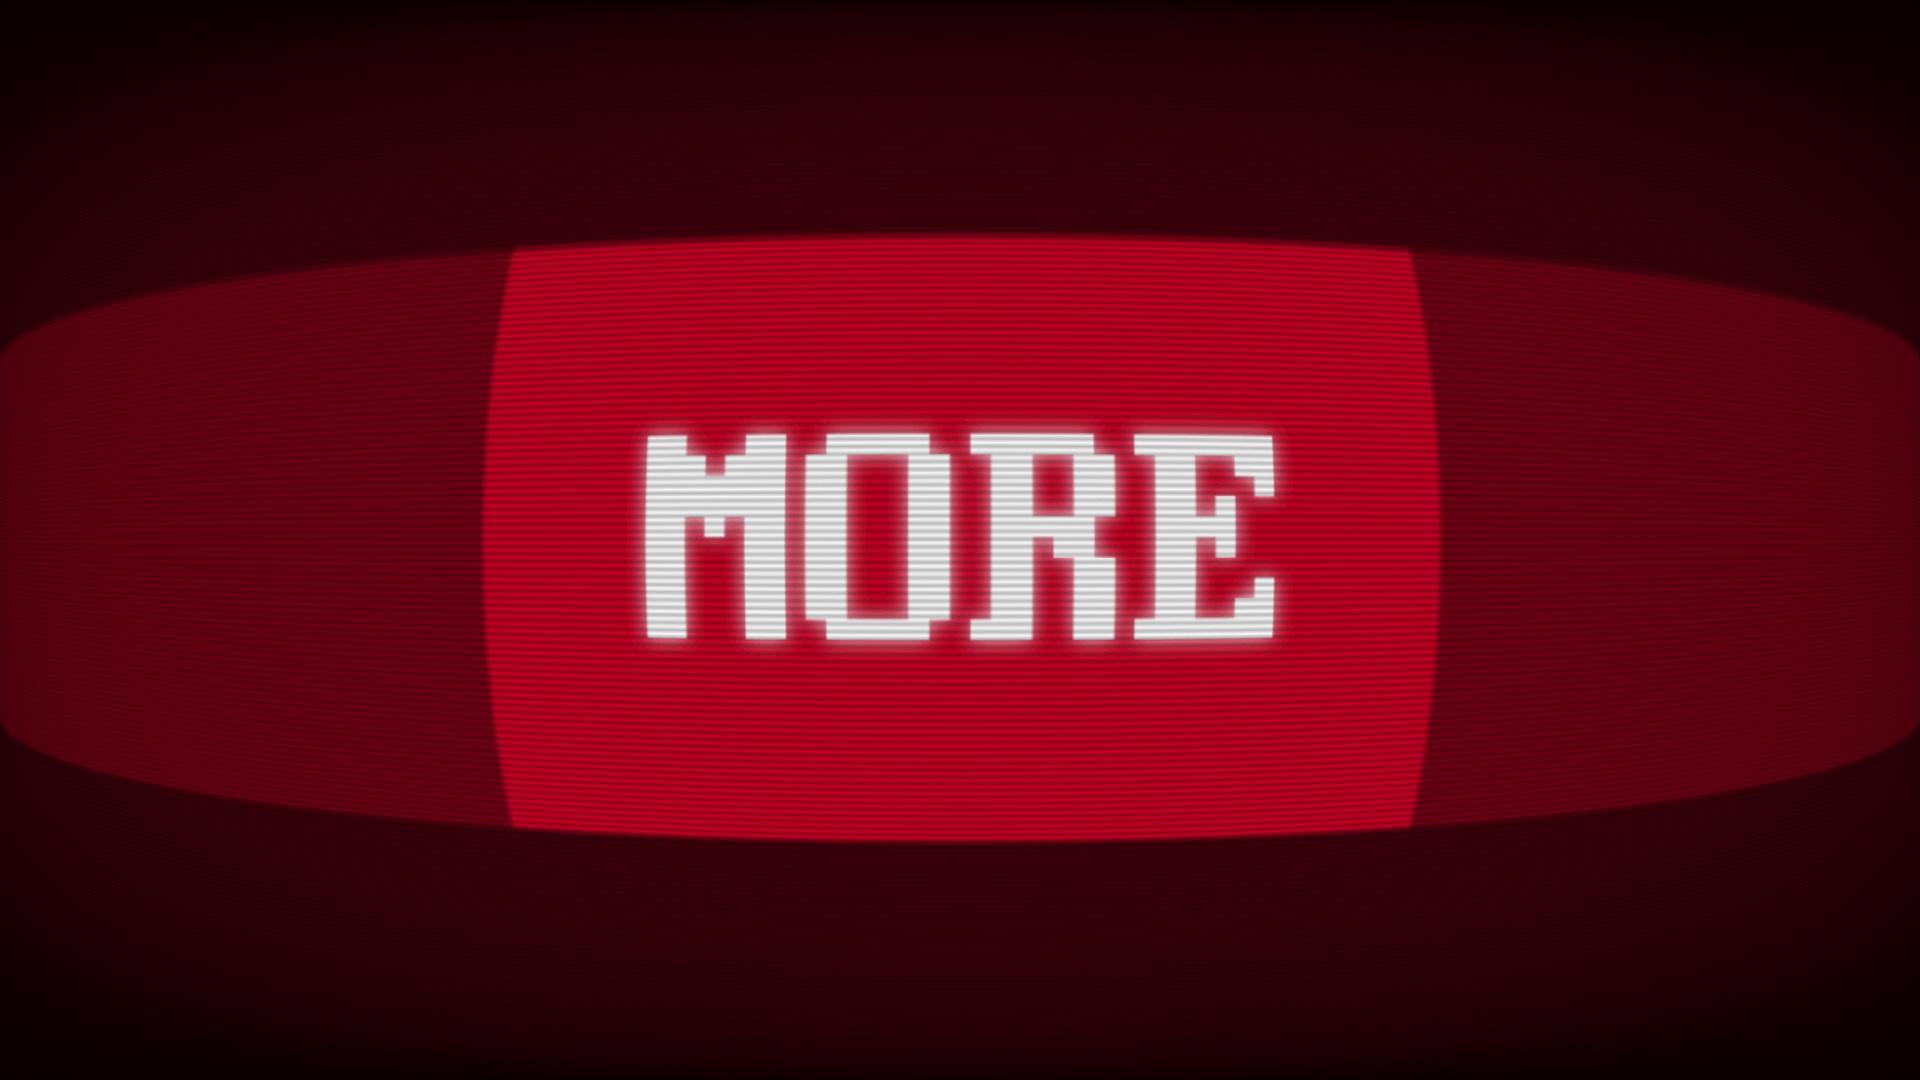 Icon for MORE slashing